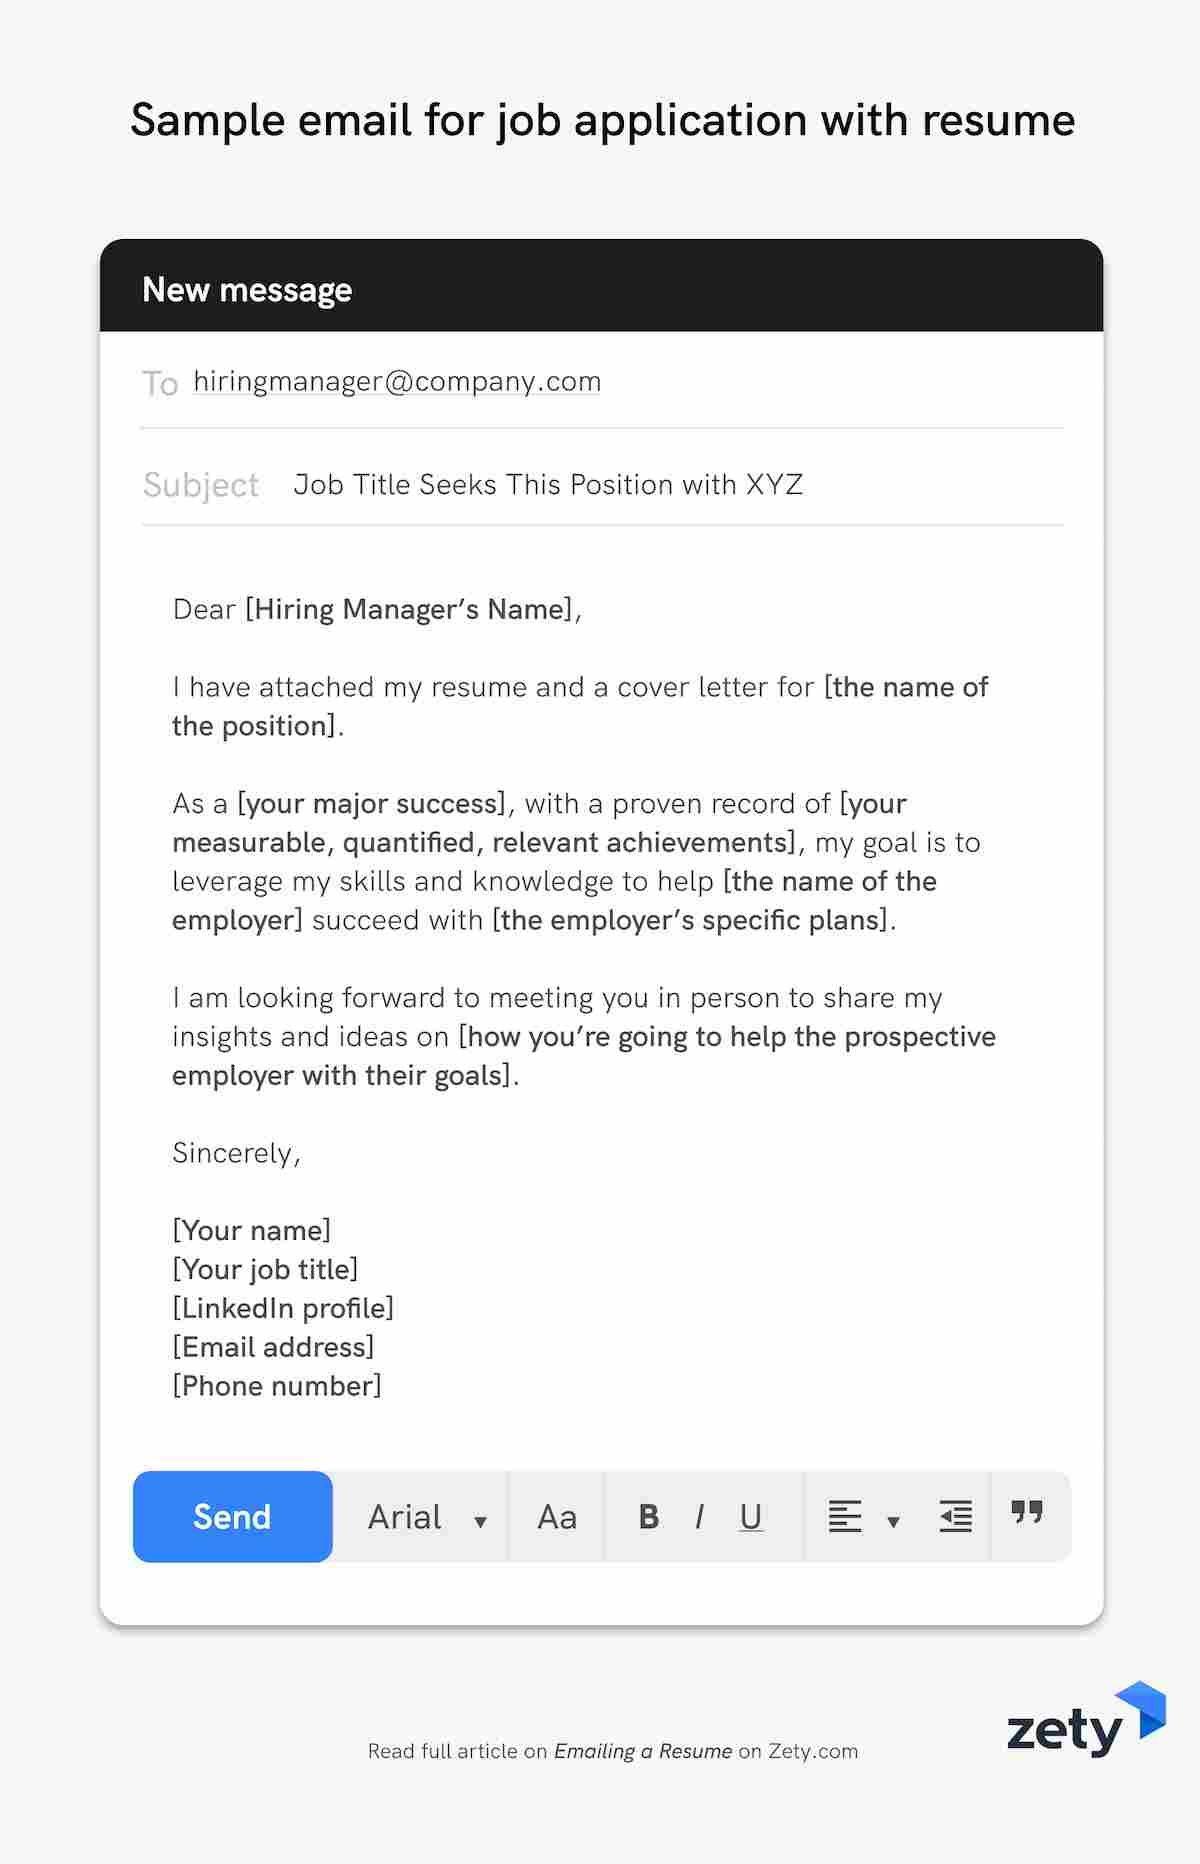 Sample Of Sending Resume by Email Emailing A Resume: 12lancarrezekiq Job Application Email Samples